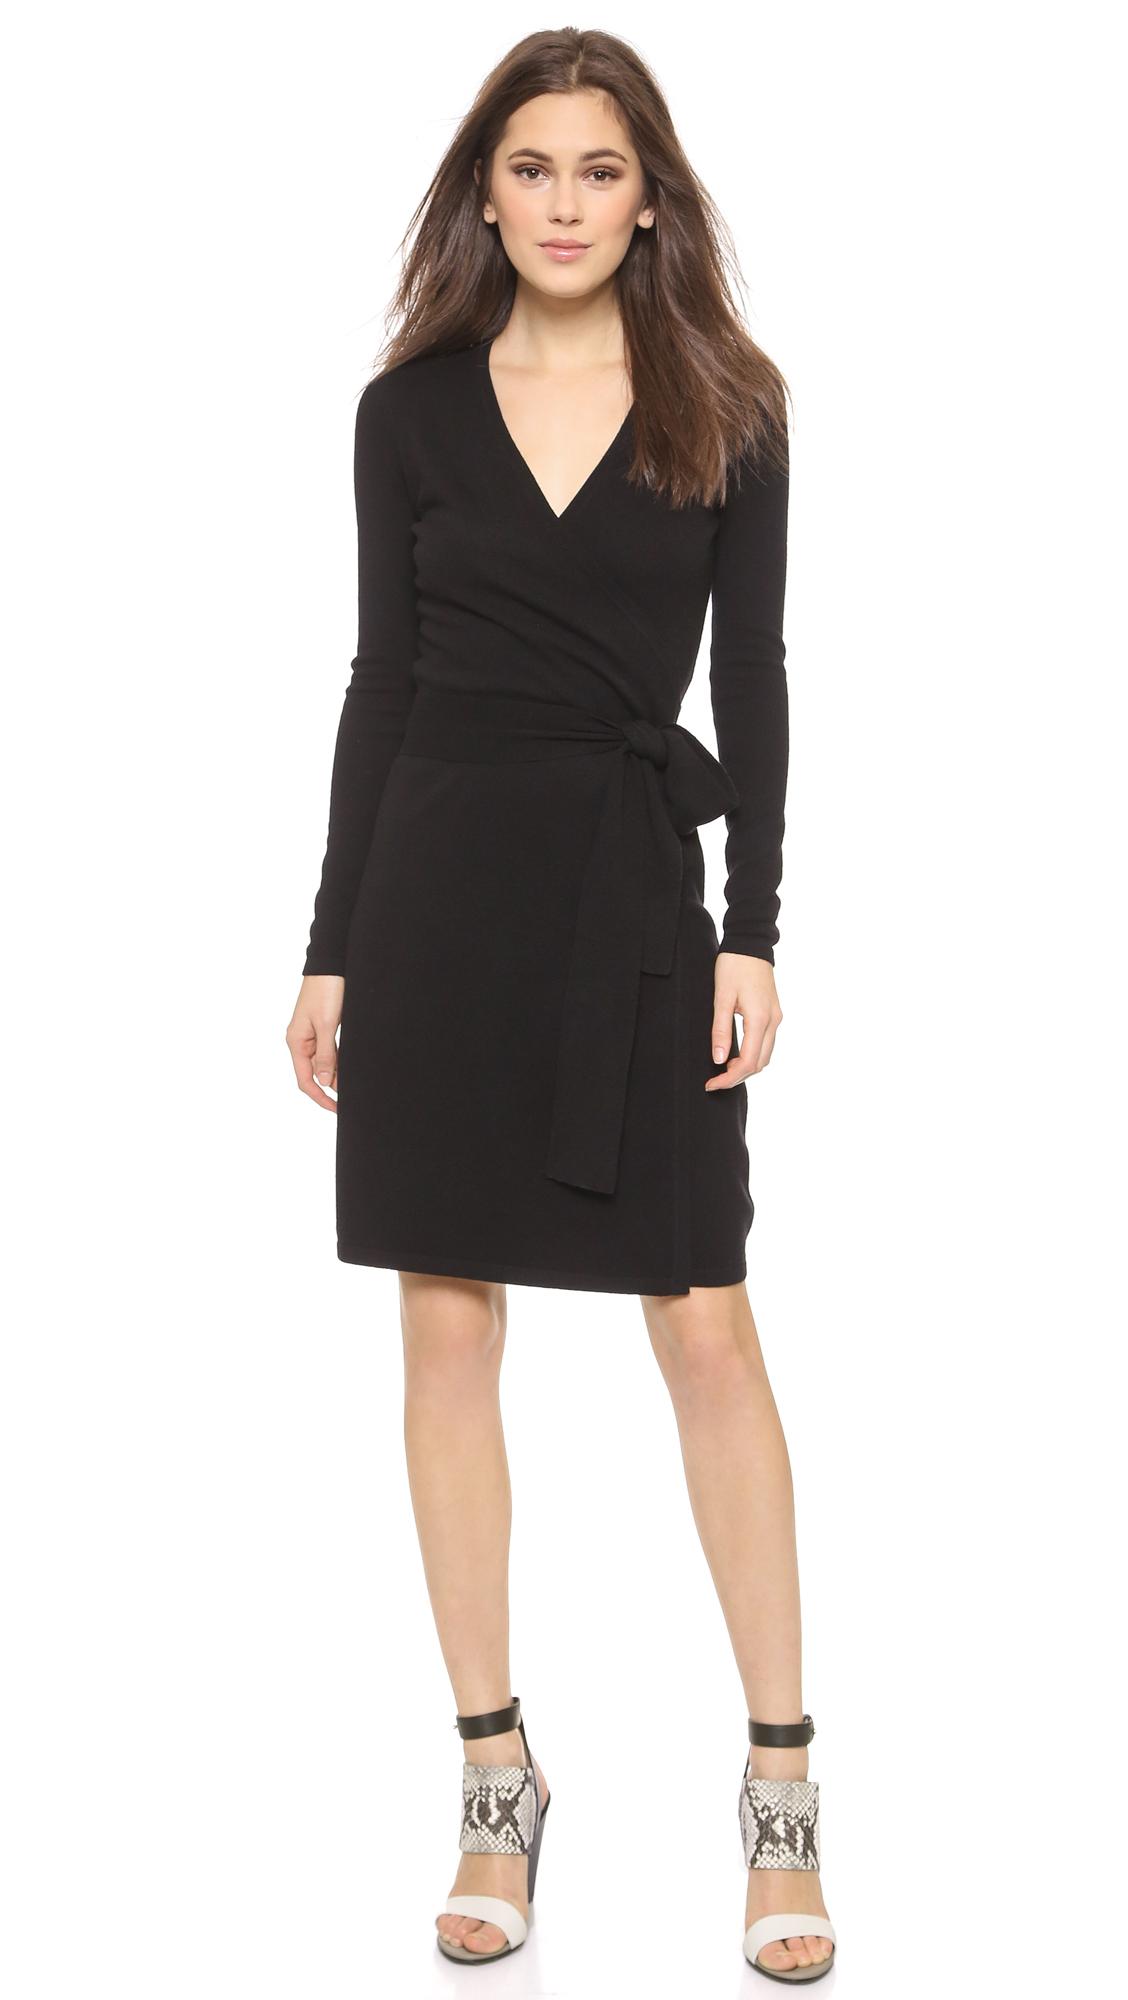 a76242bde58 Diane von Furstenberg Linda Wrap Sweater Dress - Black in Black - Lyst